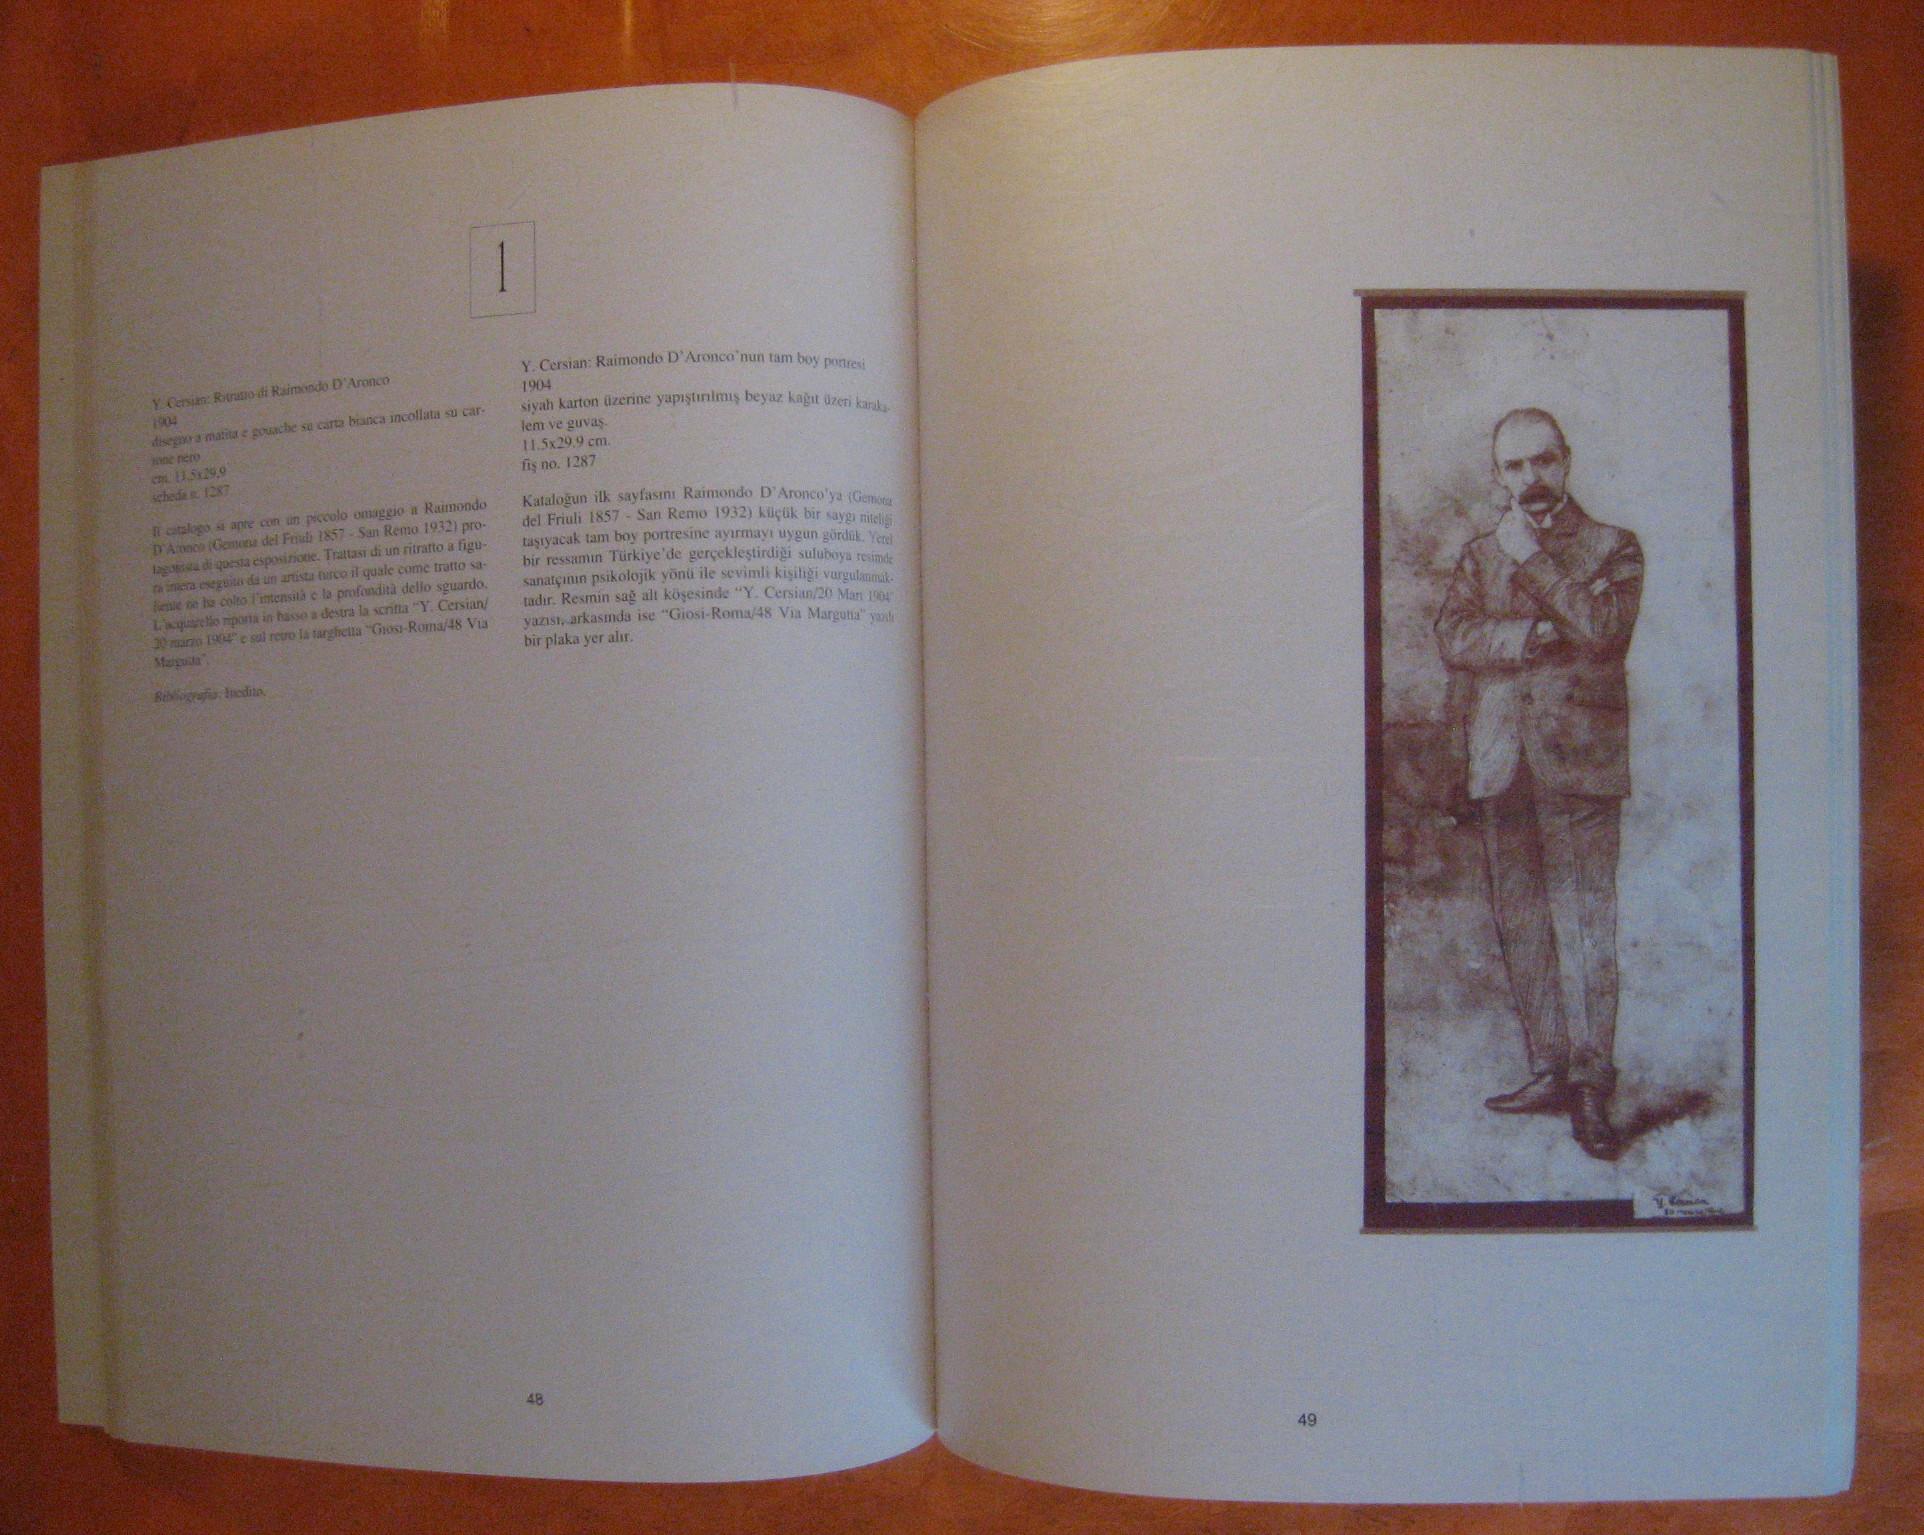 Image for Raimondo d'Aronco in Turchia, (1893-1909). Progetti della Galleria di Arte Moderna di Udine / Udine Çagdas Sanat Galerisi Koleksiyonundan Raimondo d'Aronco'nun Türkiye yillari, (1893-1909)